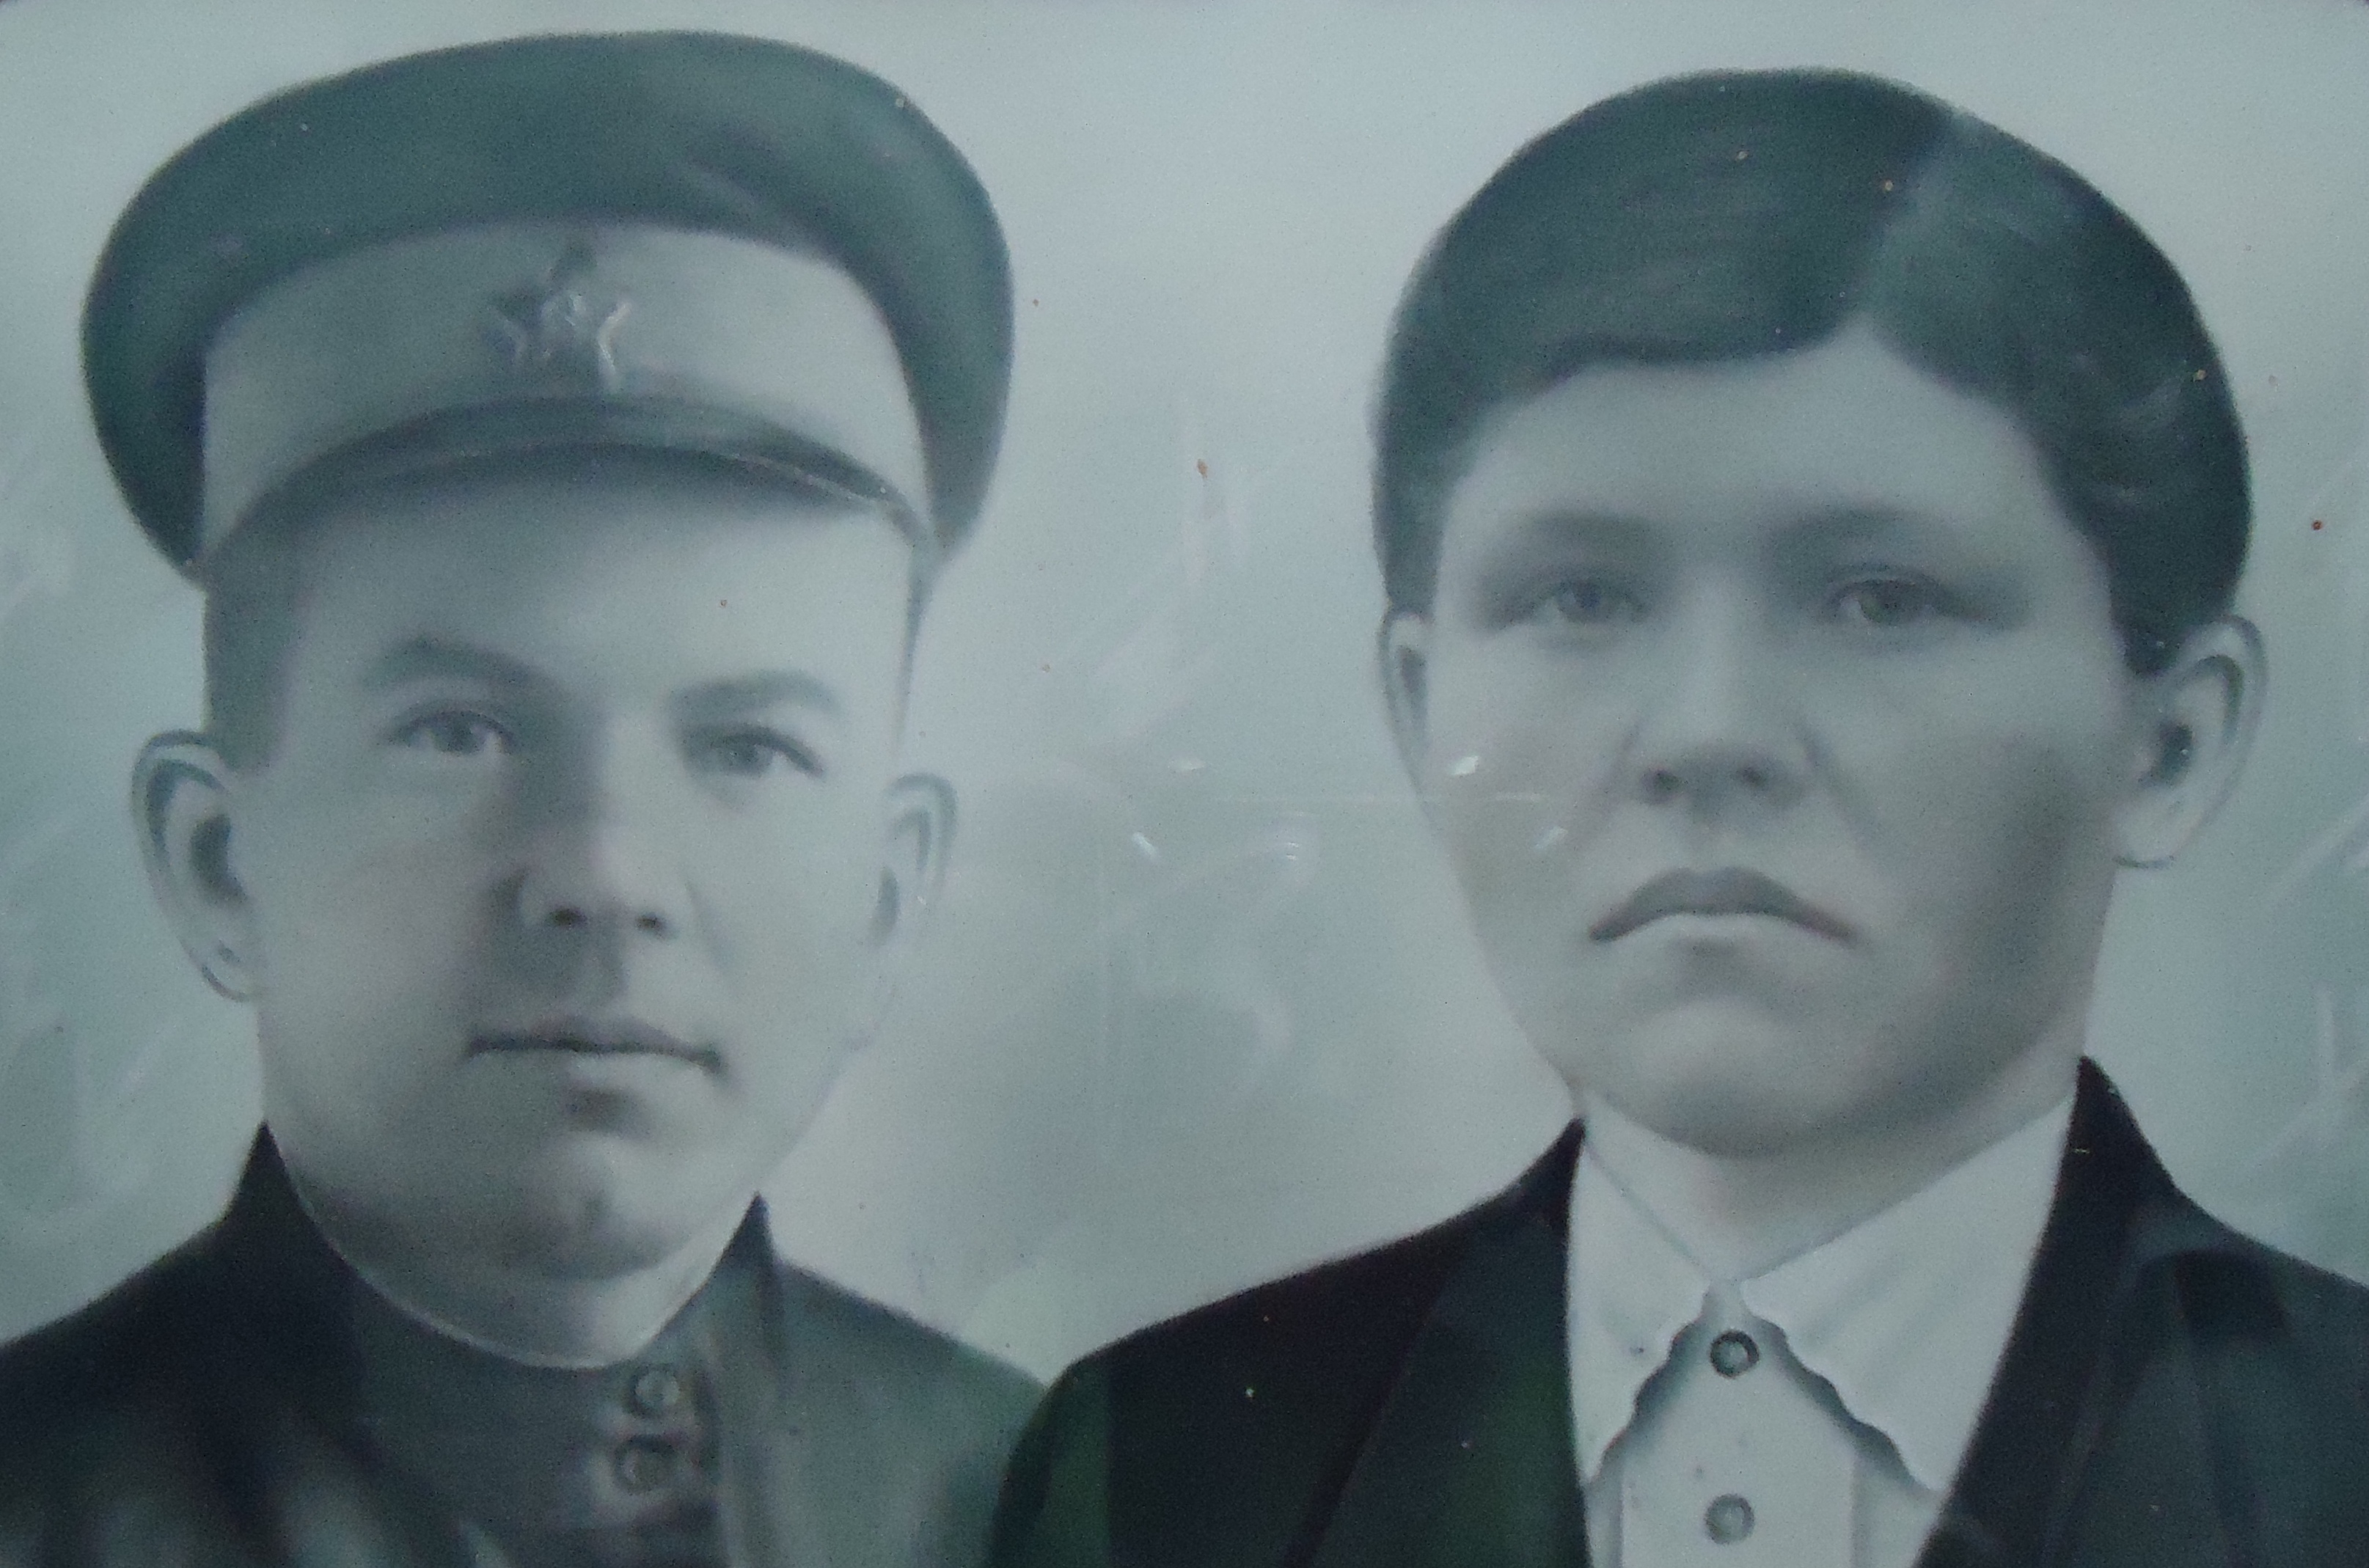 Солдат и бигуди (+18)